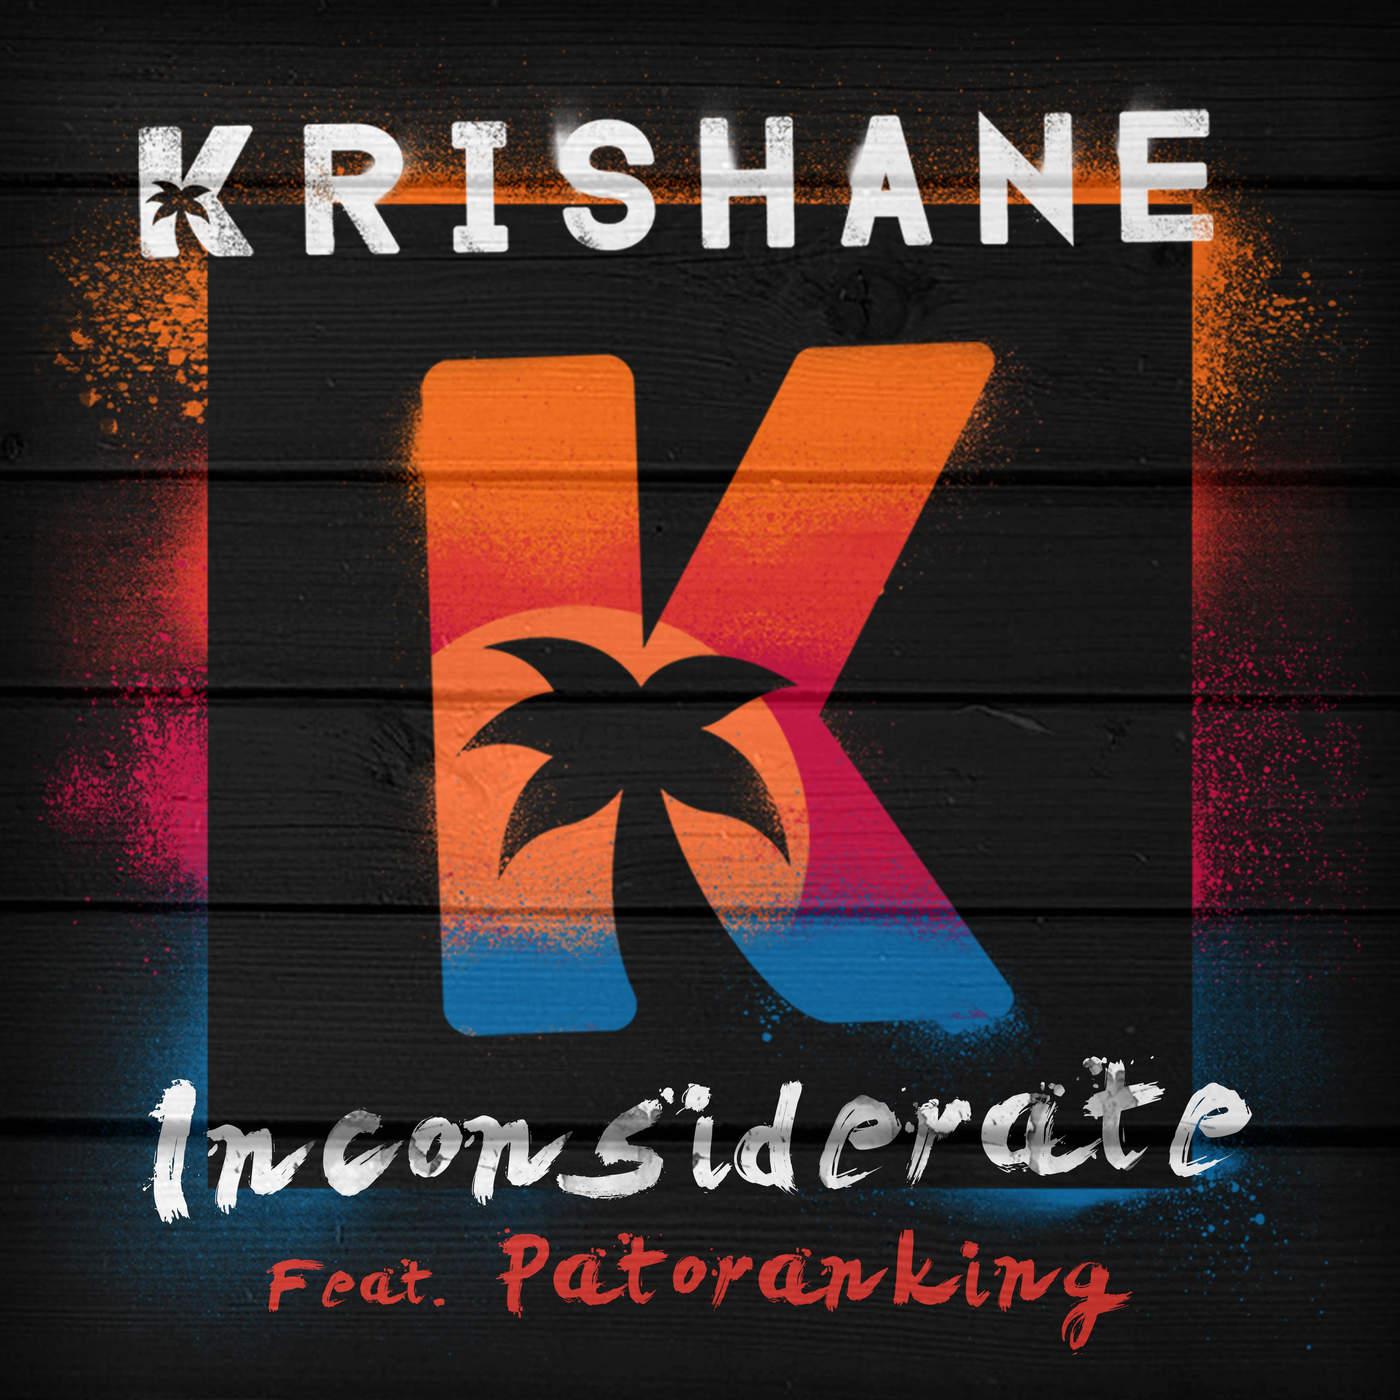 Inconsiderate (feat. Patoranking) - Single.jpg